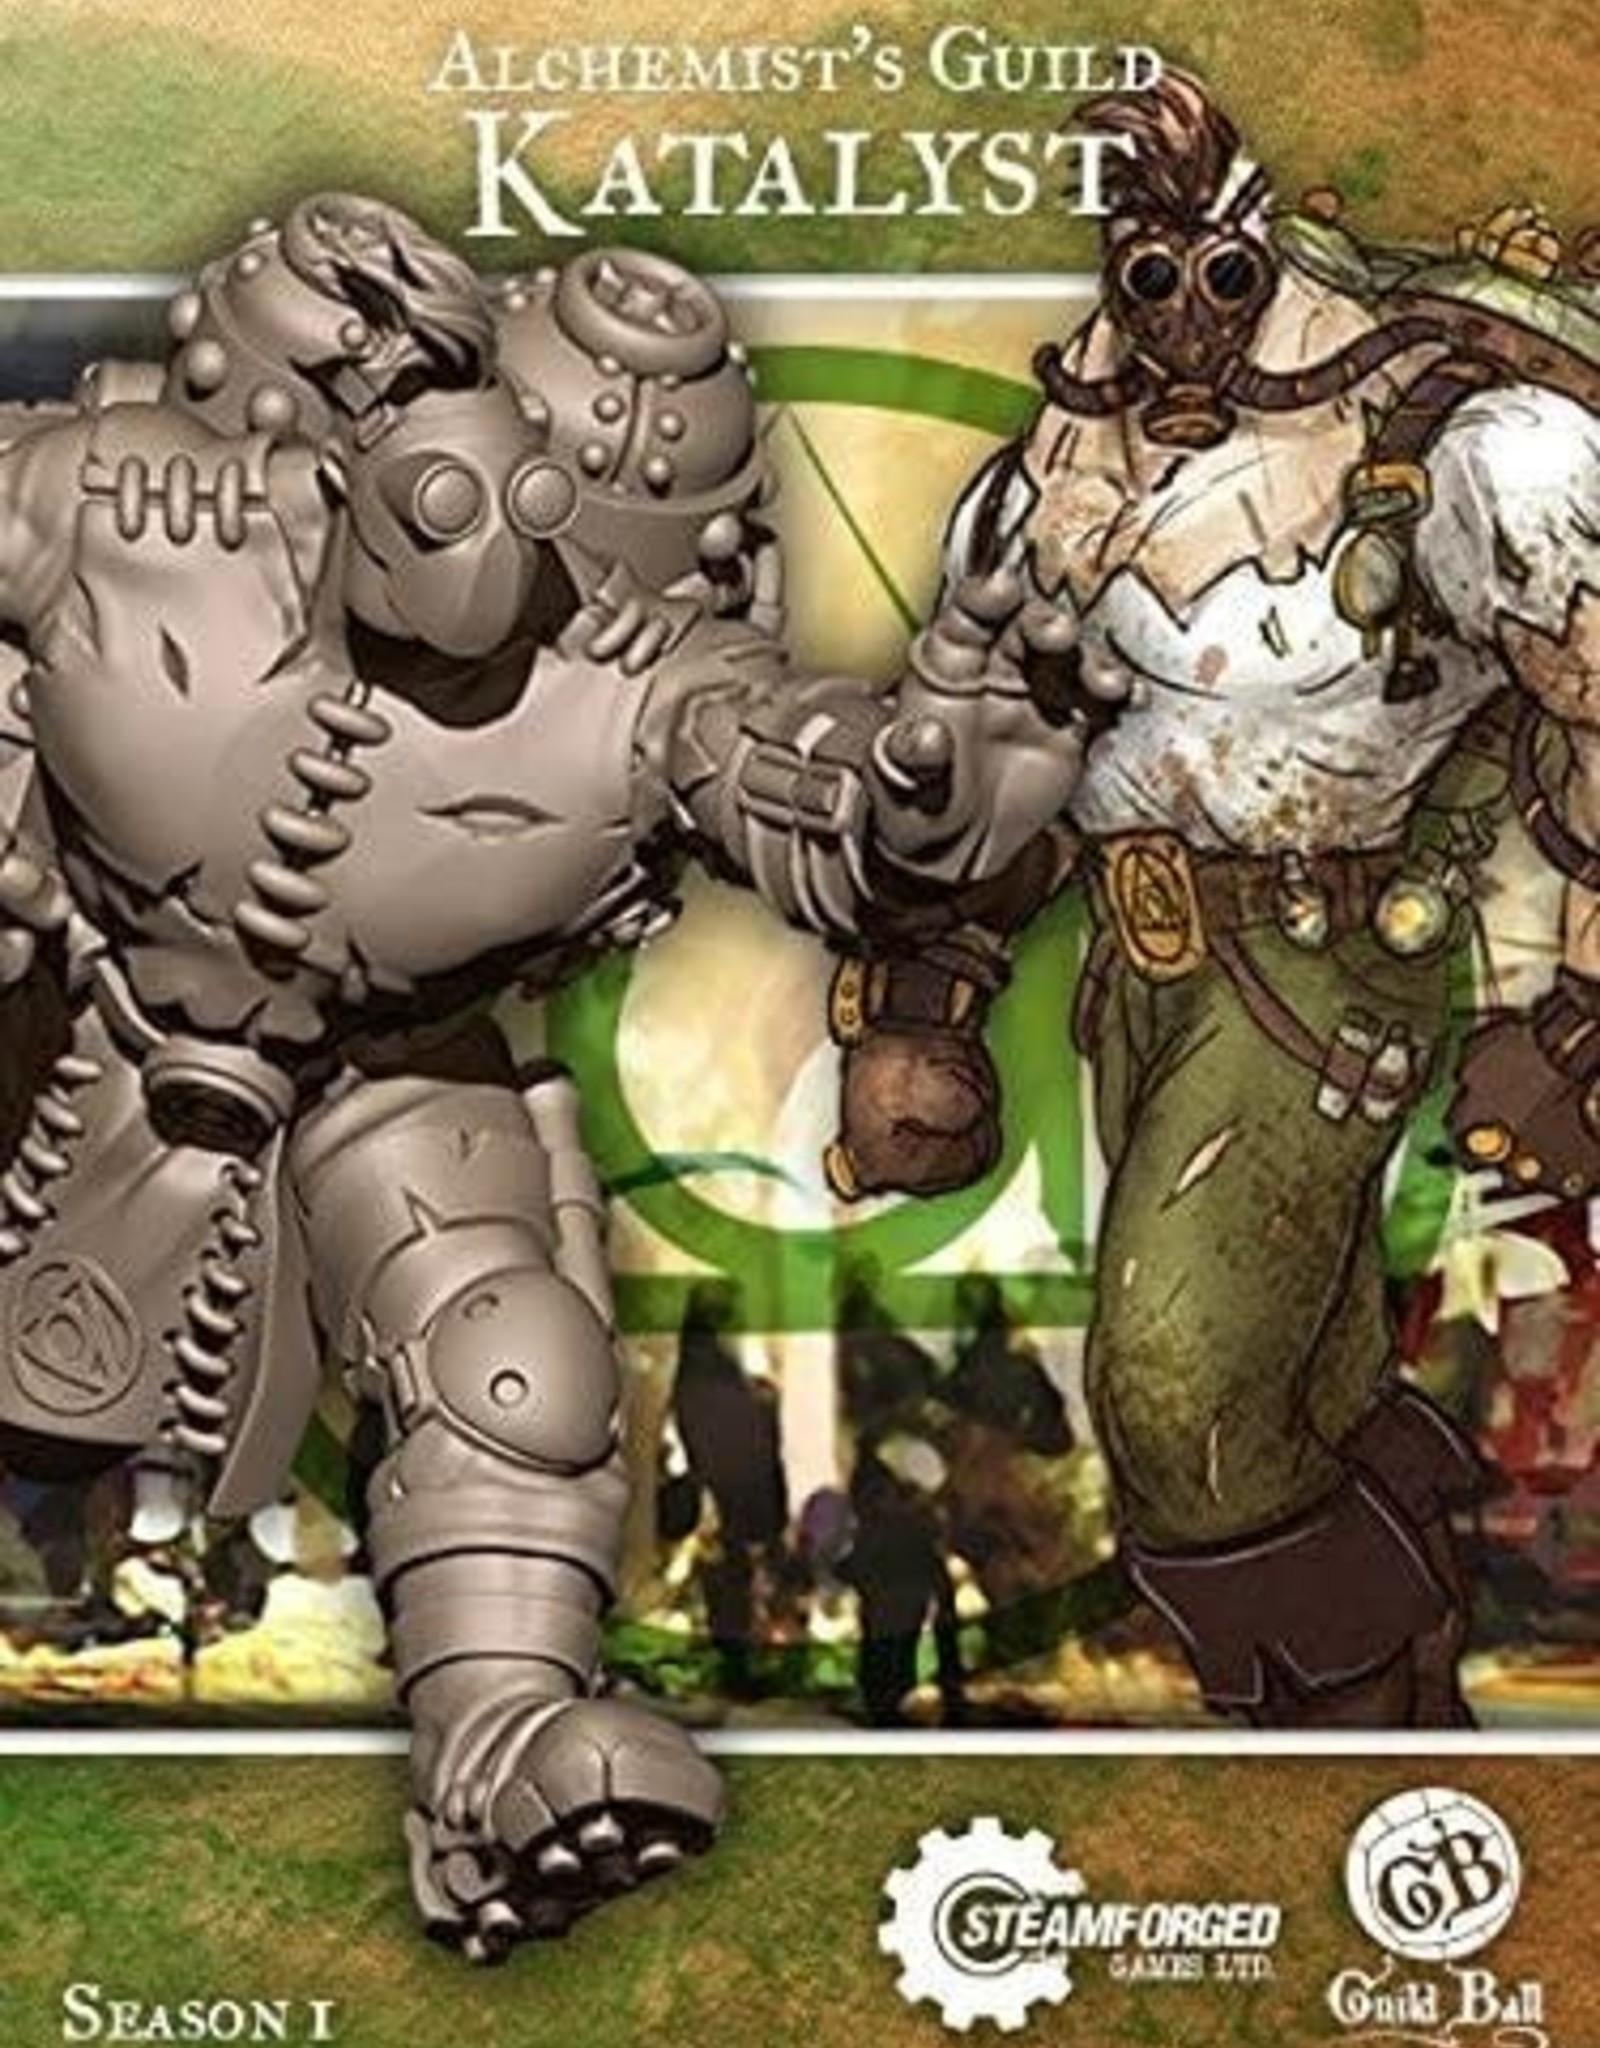 Guild Ball GB - Alchemist: Katalyst